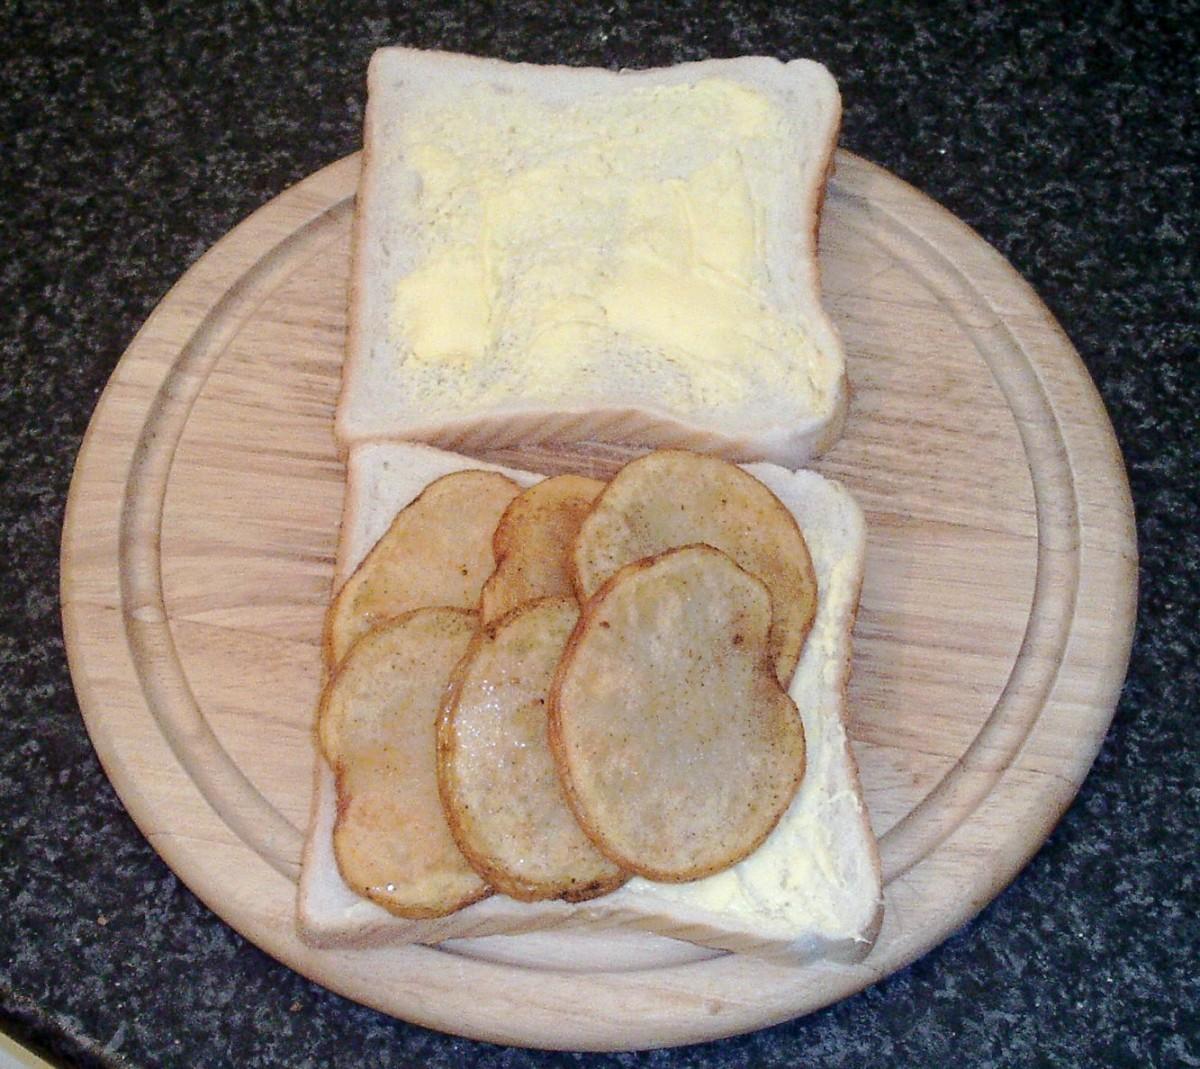 Potato slices are laid on slice of bread